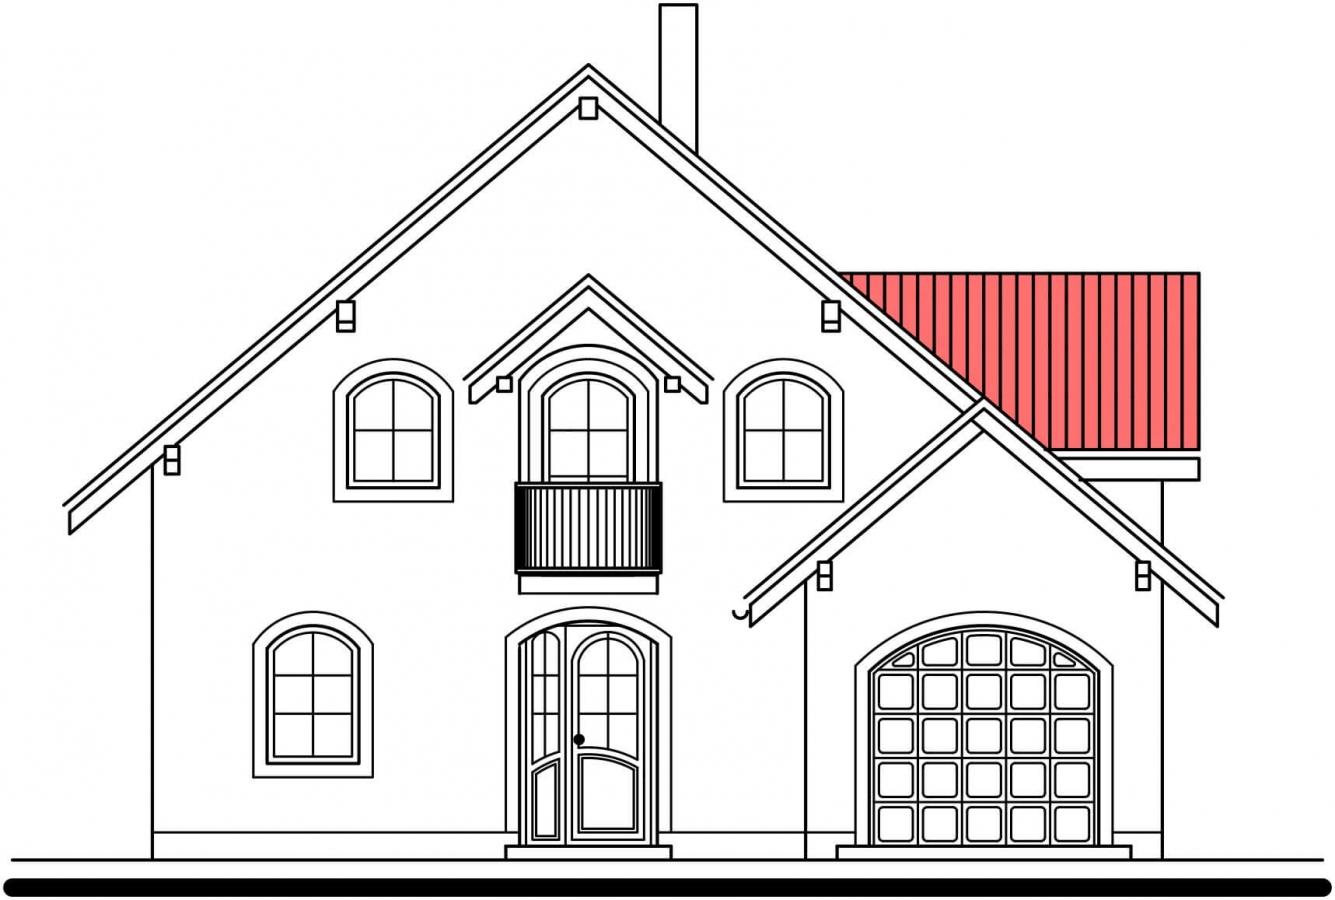 Pohľad 1. - Projekt 5-izbového domu s garážou.